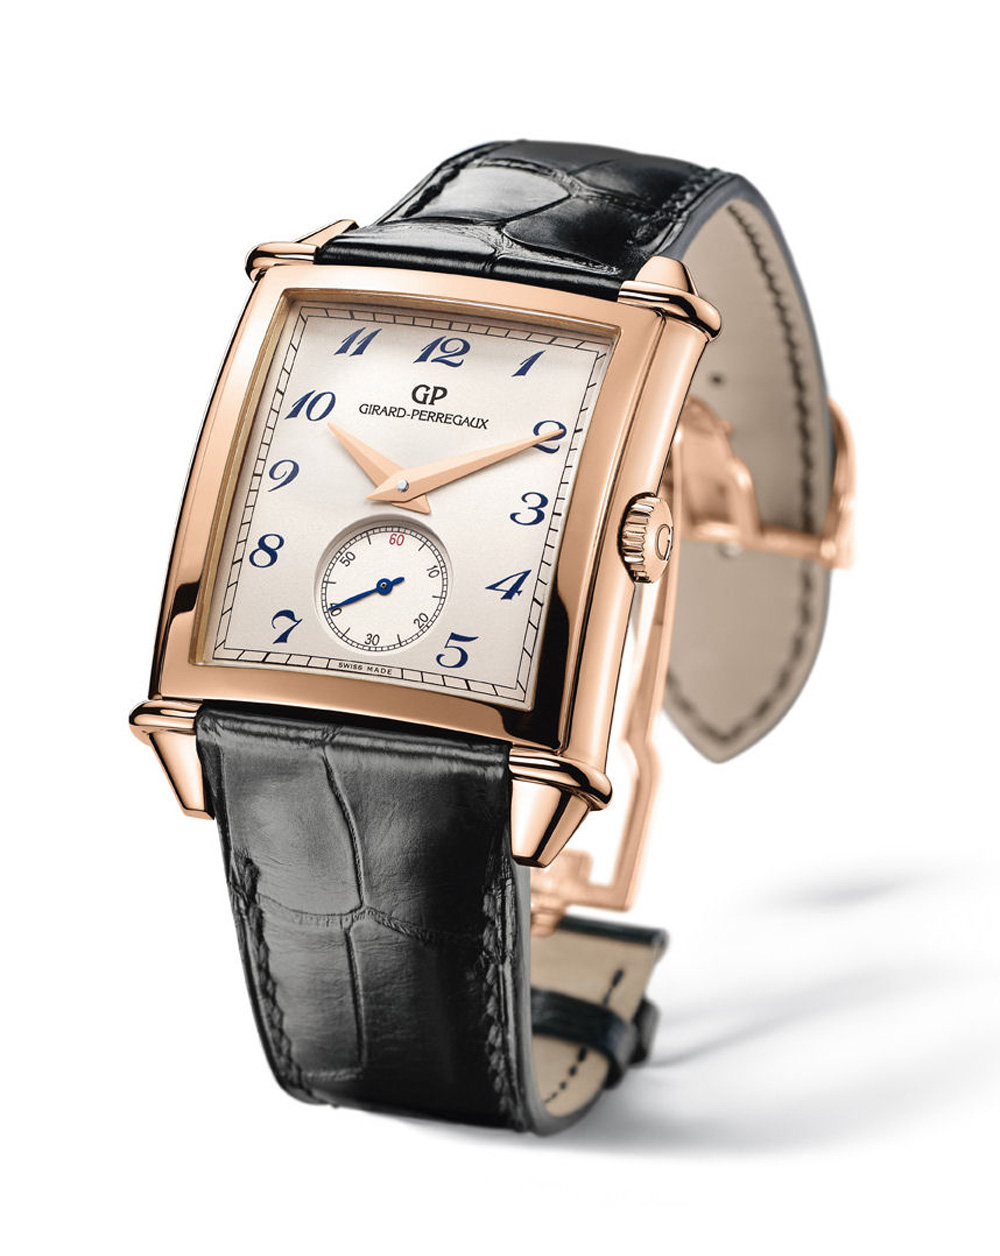 Girard-Perregaux Vintage 1945 XXL Watch